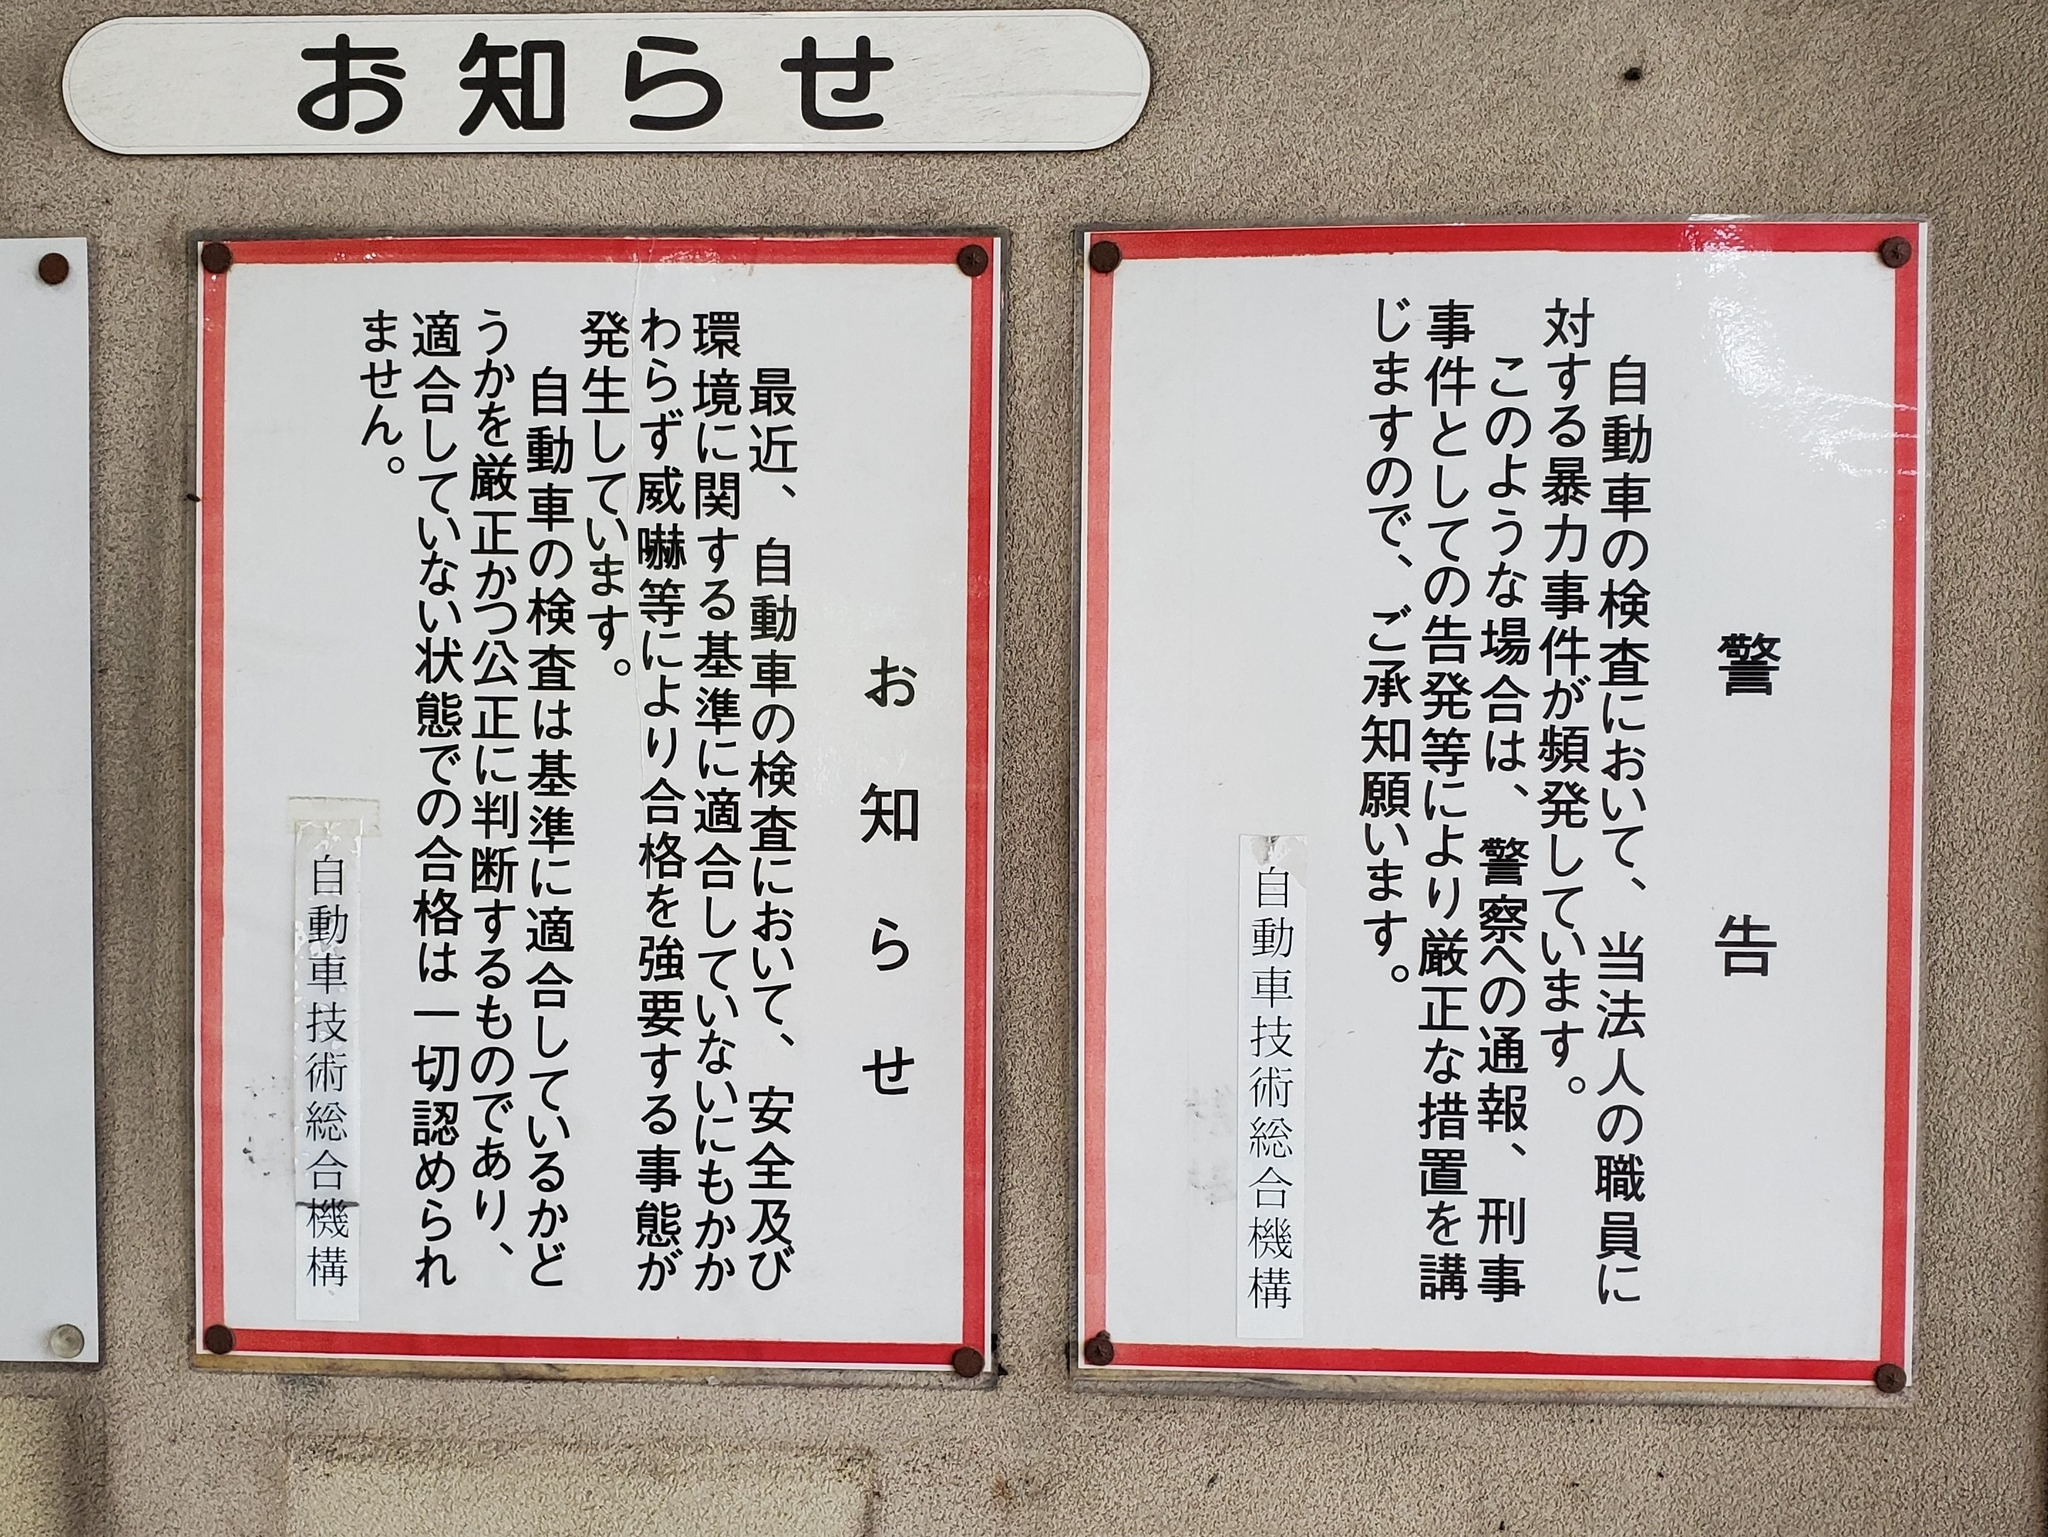 f:id:ToshUeno:20210816142256j:plain